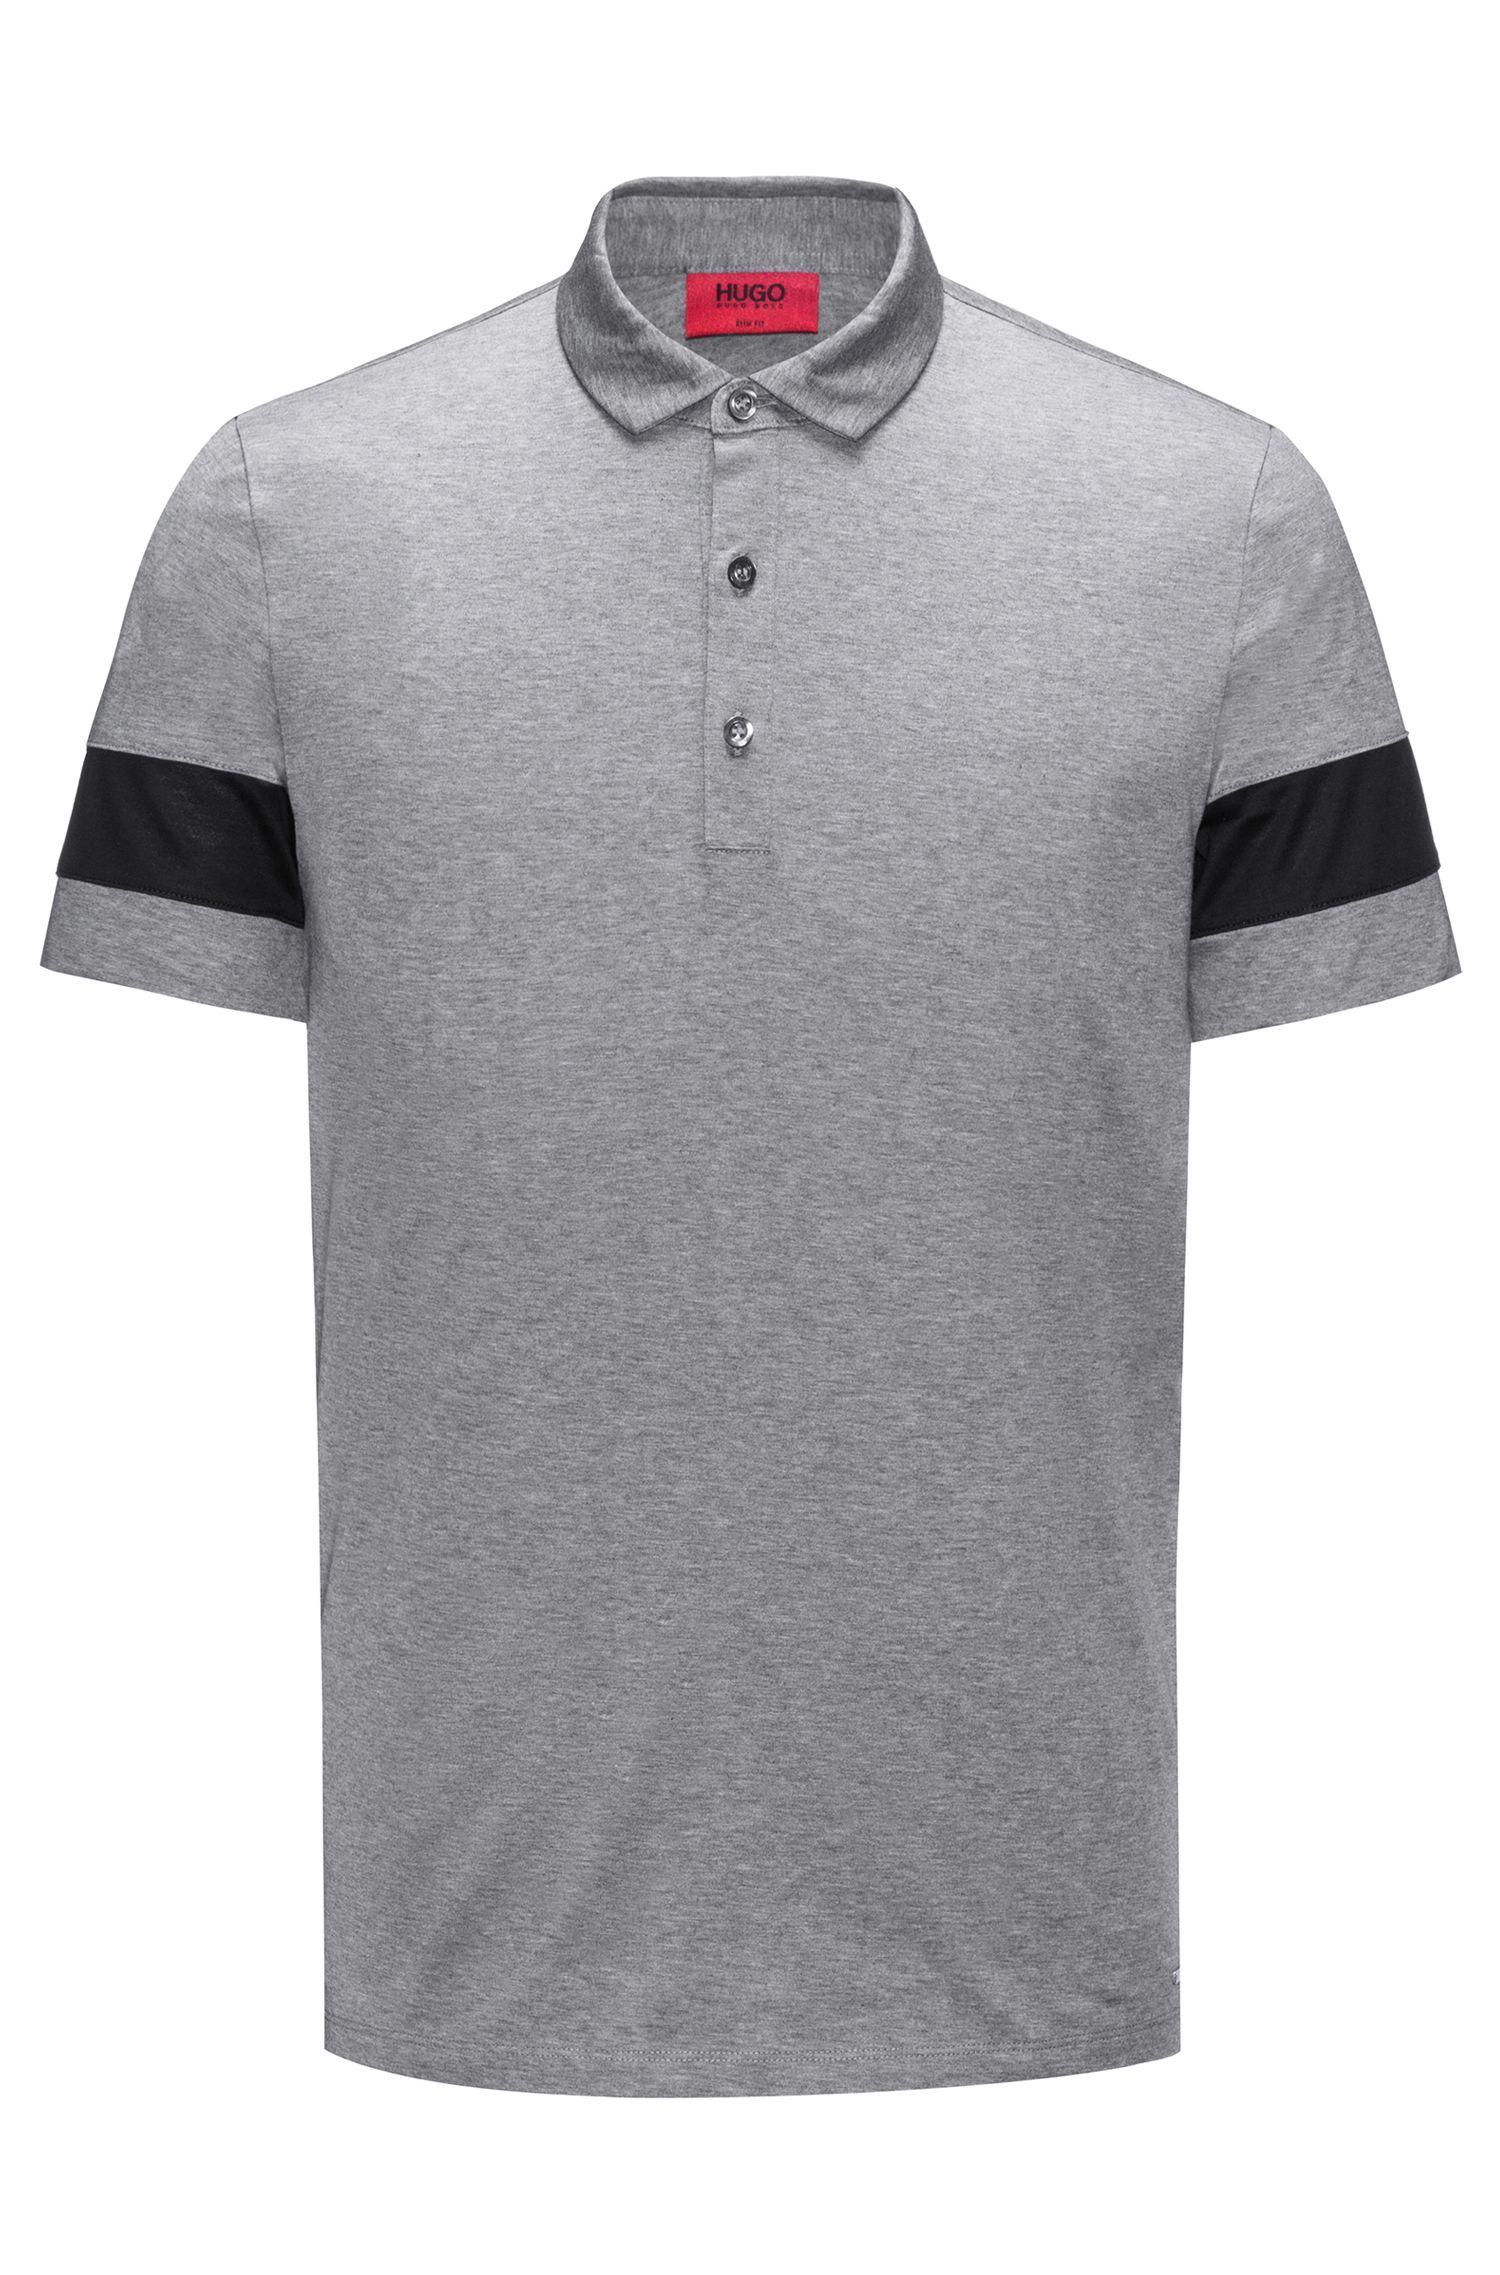 Thick-Striped Mercerized Cotton Polo Shirt, Slim Fit | Drooks